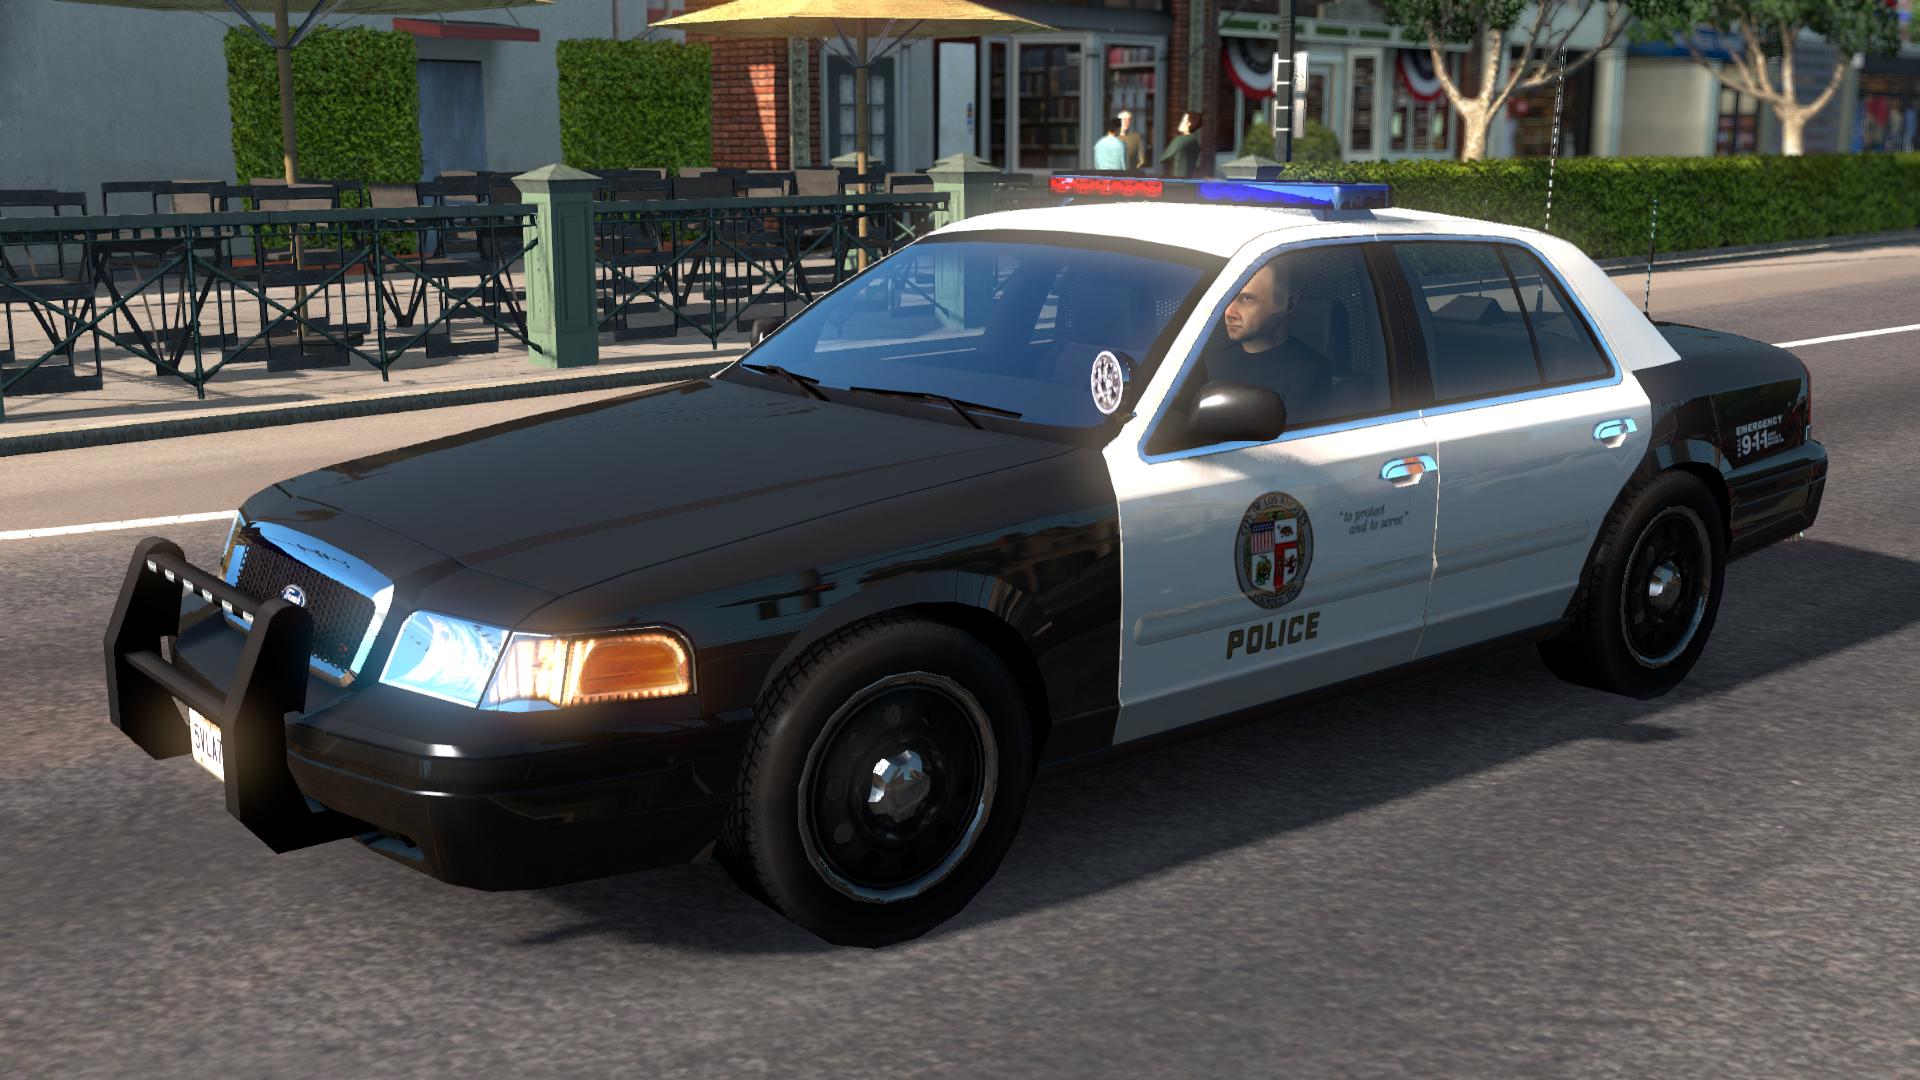 Police Truck Simulator Wiki Fandom Powered By Wikia 1969 Ford Crown Victoria Portland Reno San Francisco